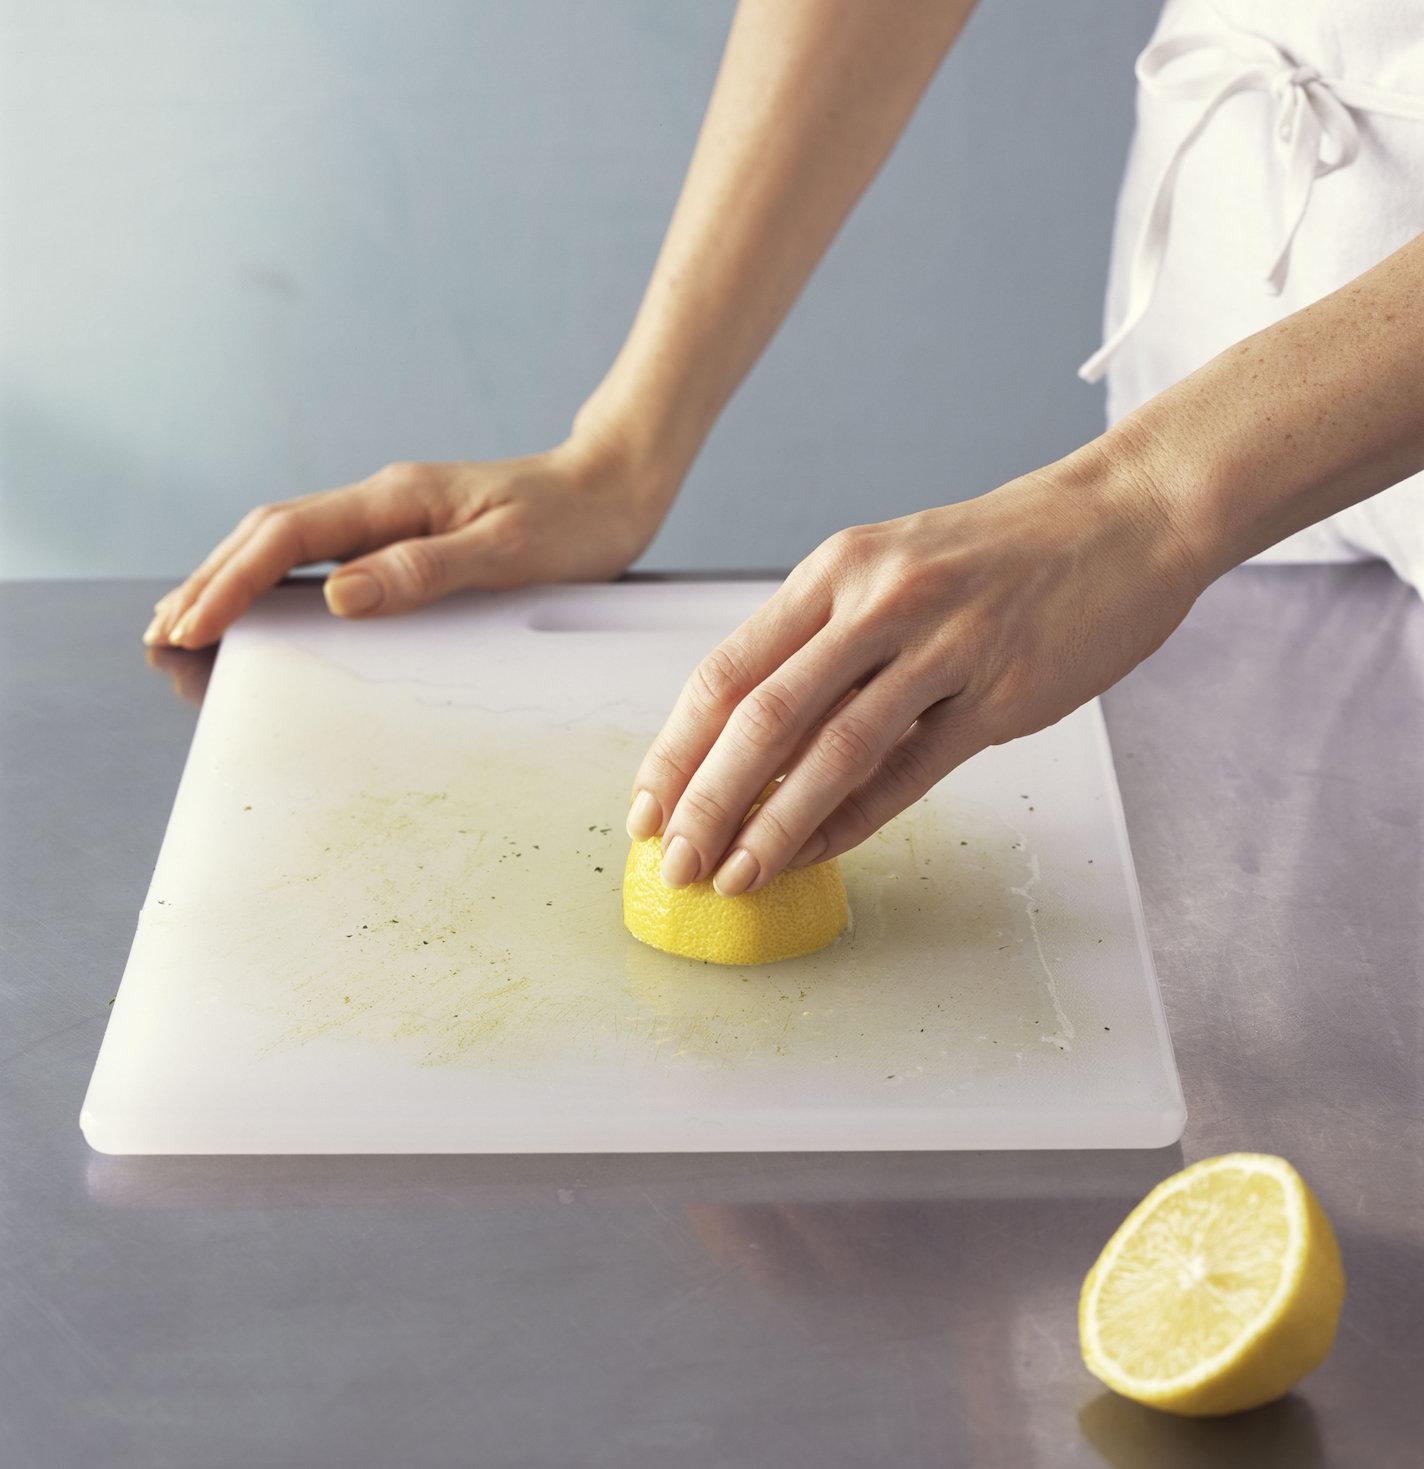 Limpieza Limón Hogar